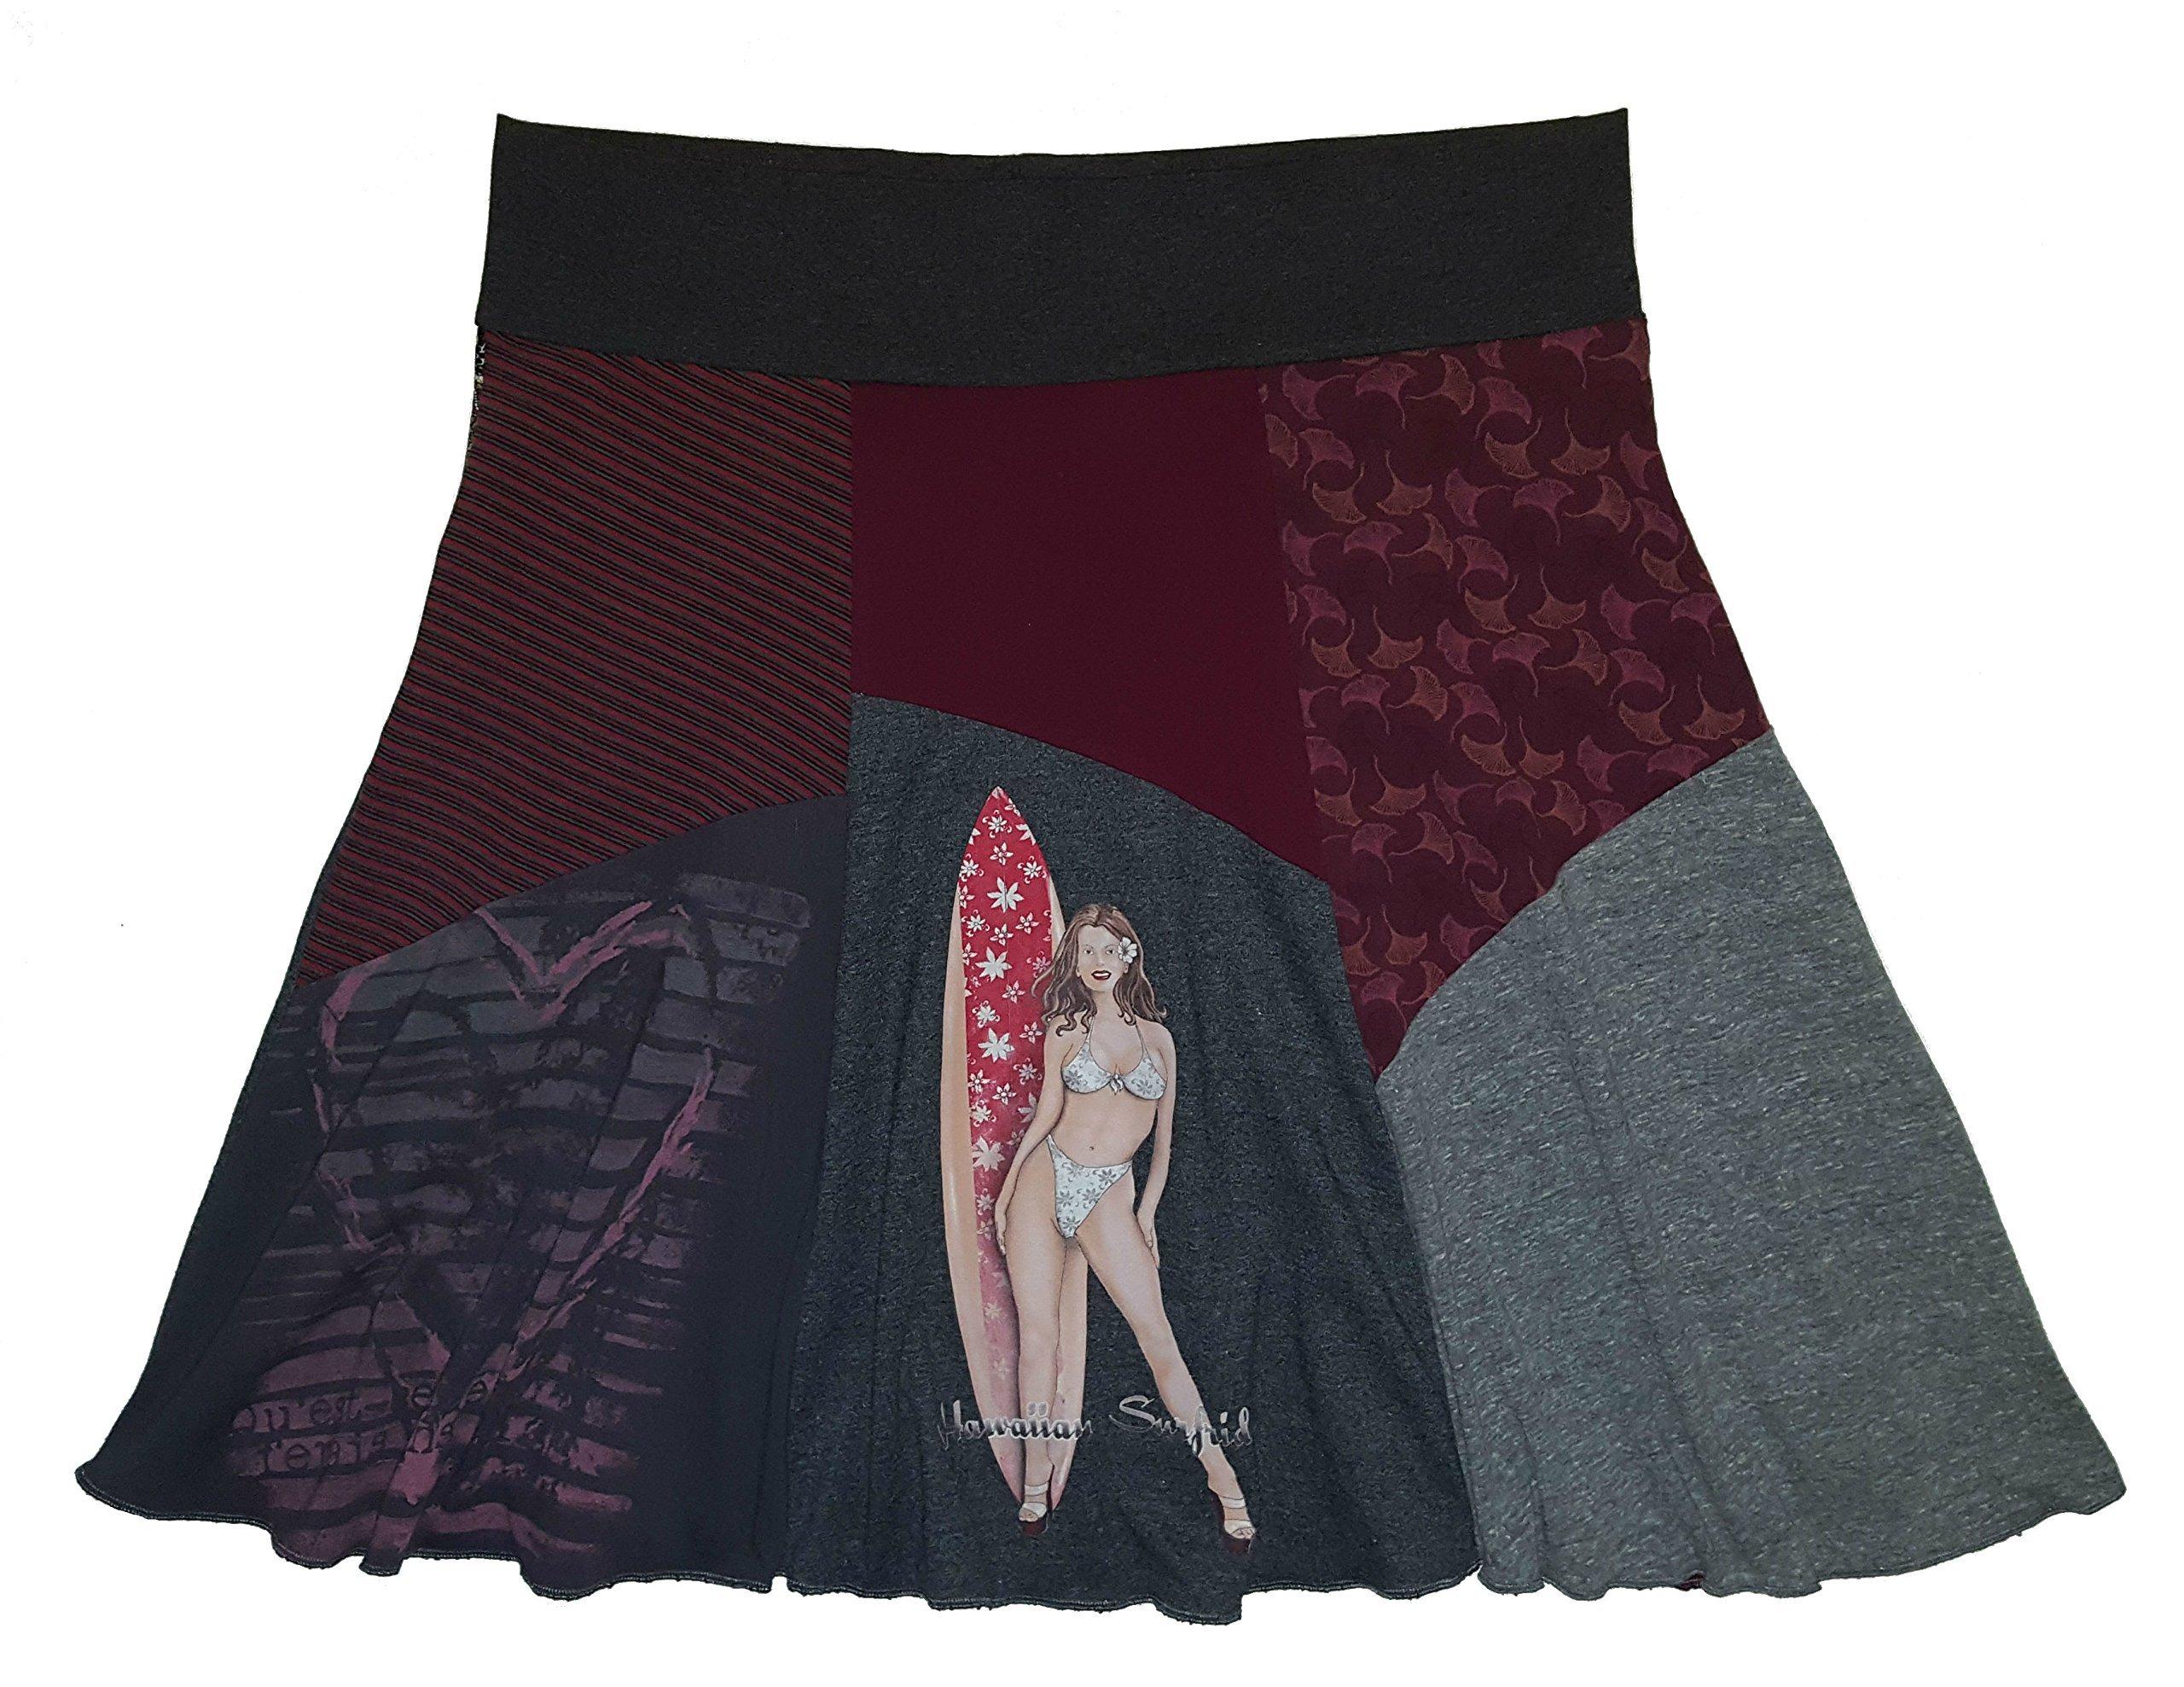 Plus Size Skirt Surfer Girl T-Shirt Women's 2X 3X One of a Kind Handmade Upcycled Skirt